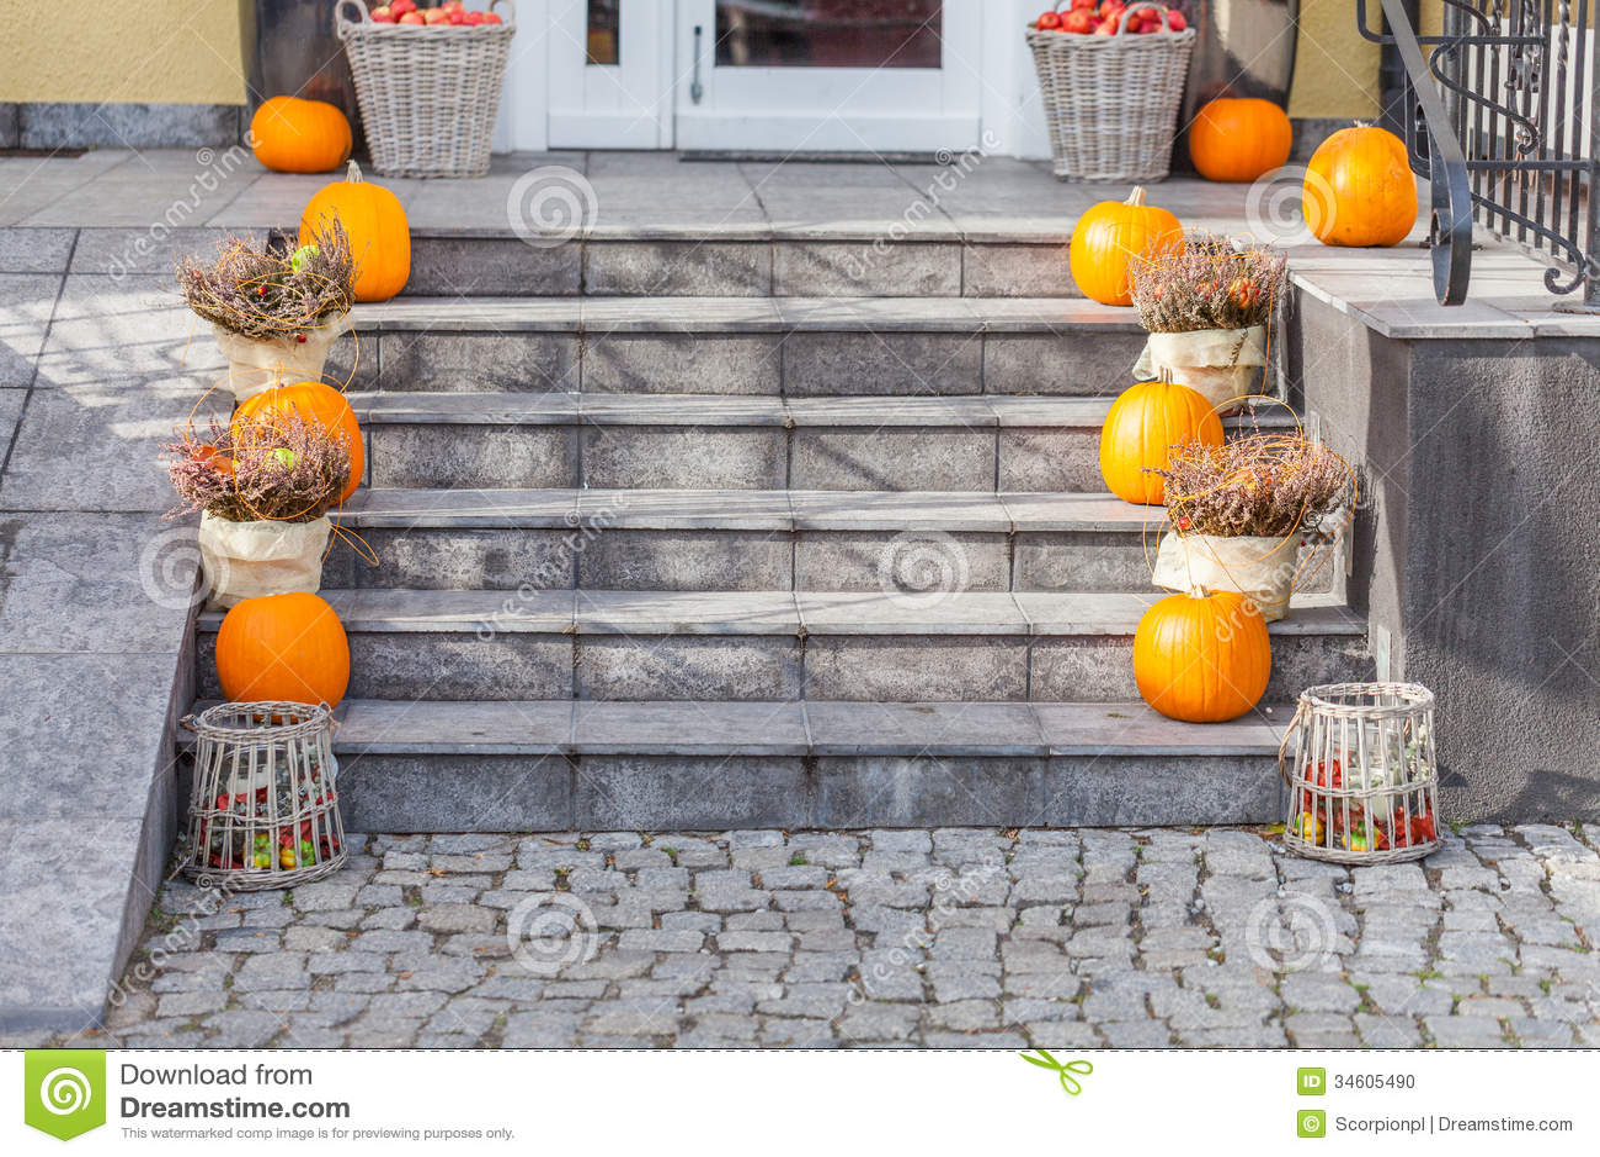 urban decor for halloween stock photo - Urban Decor